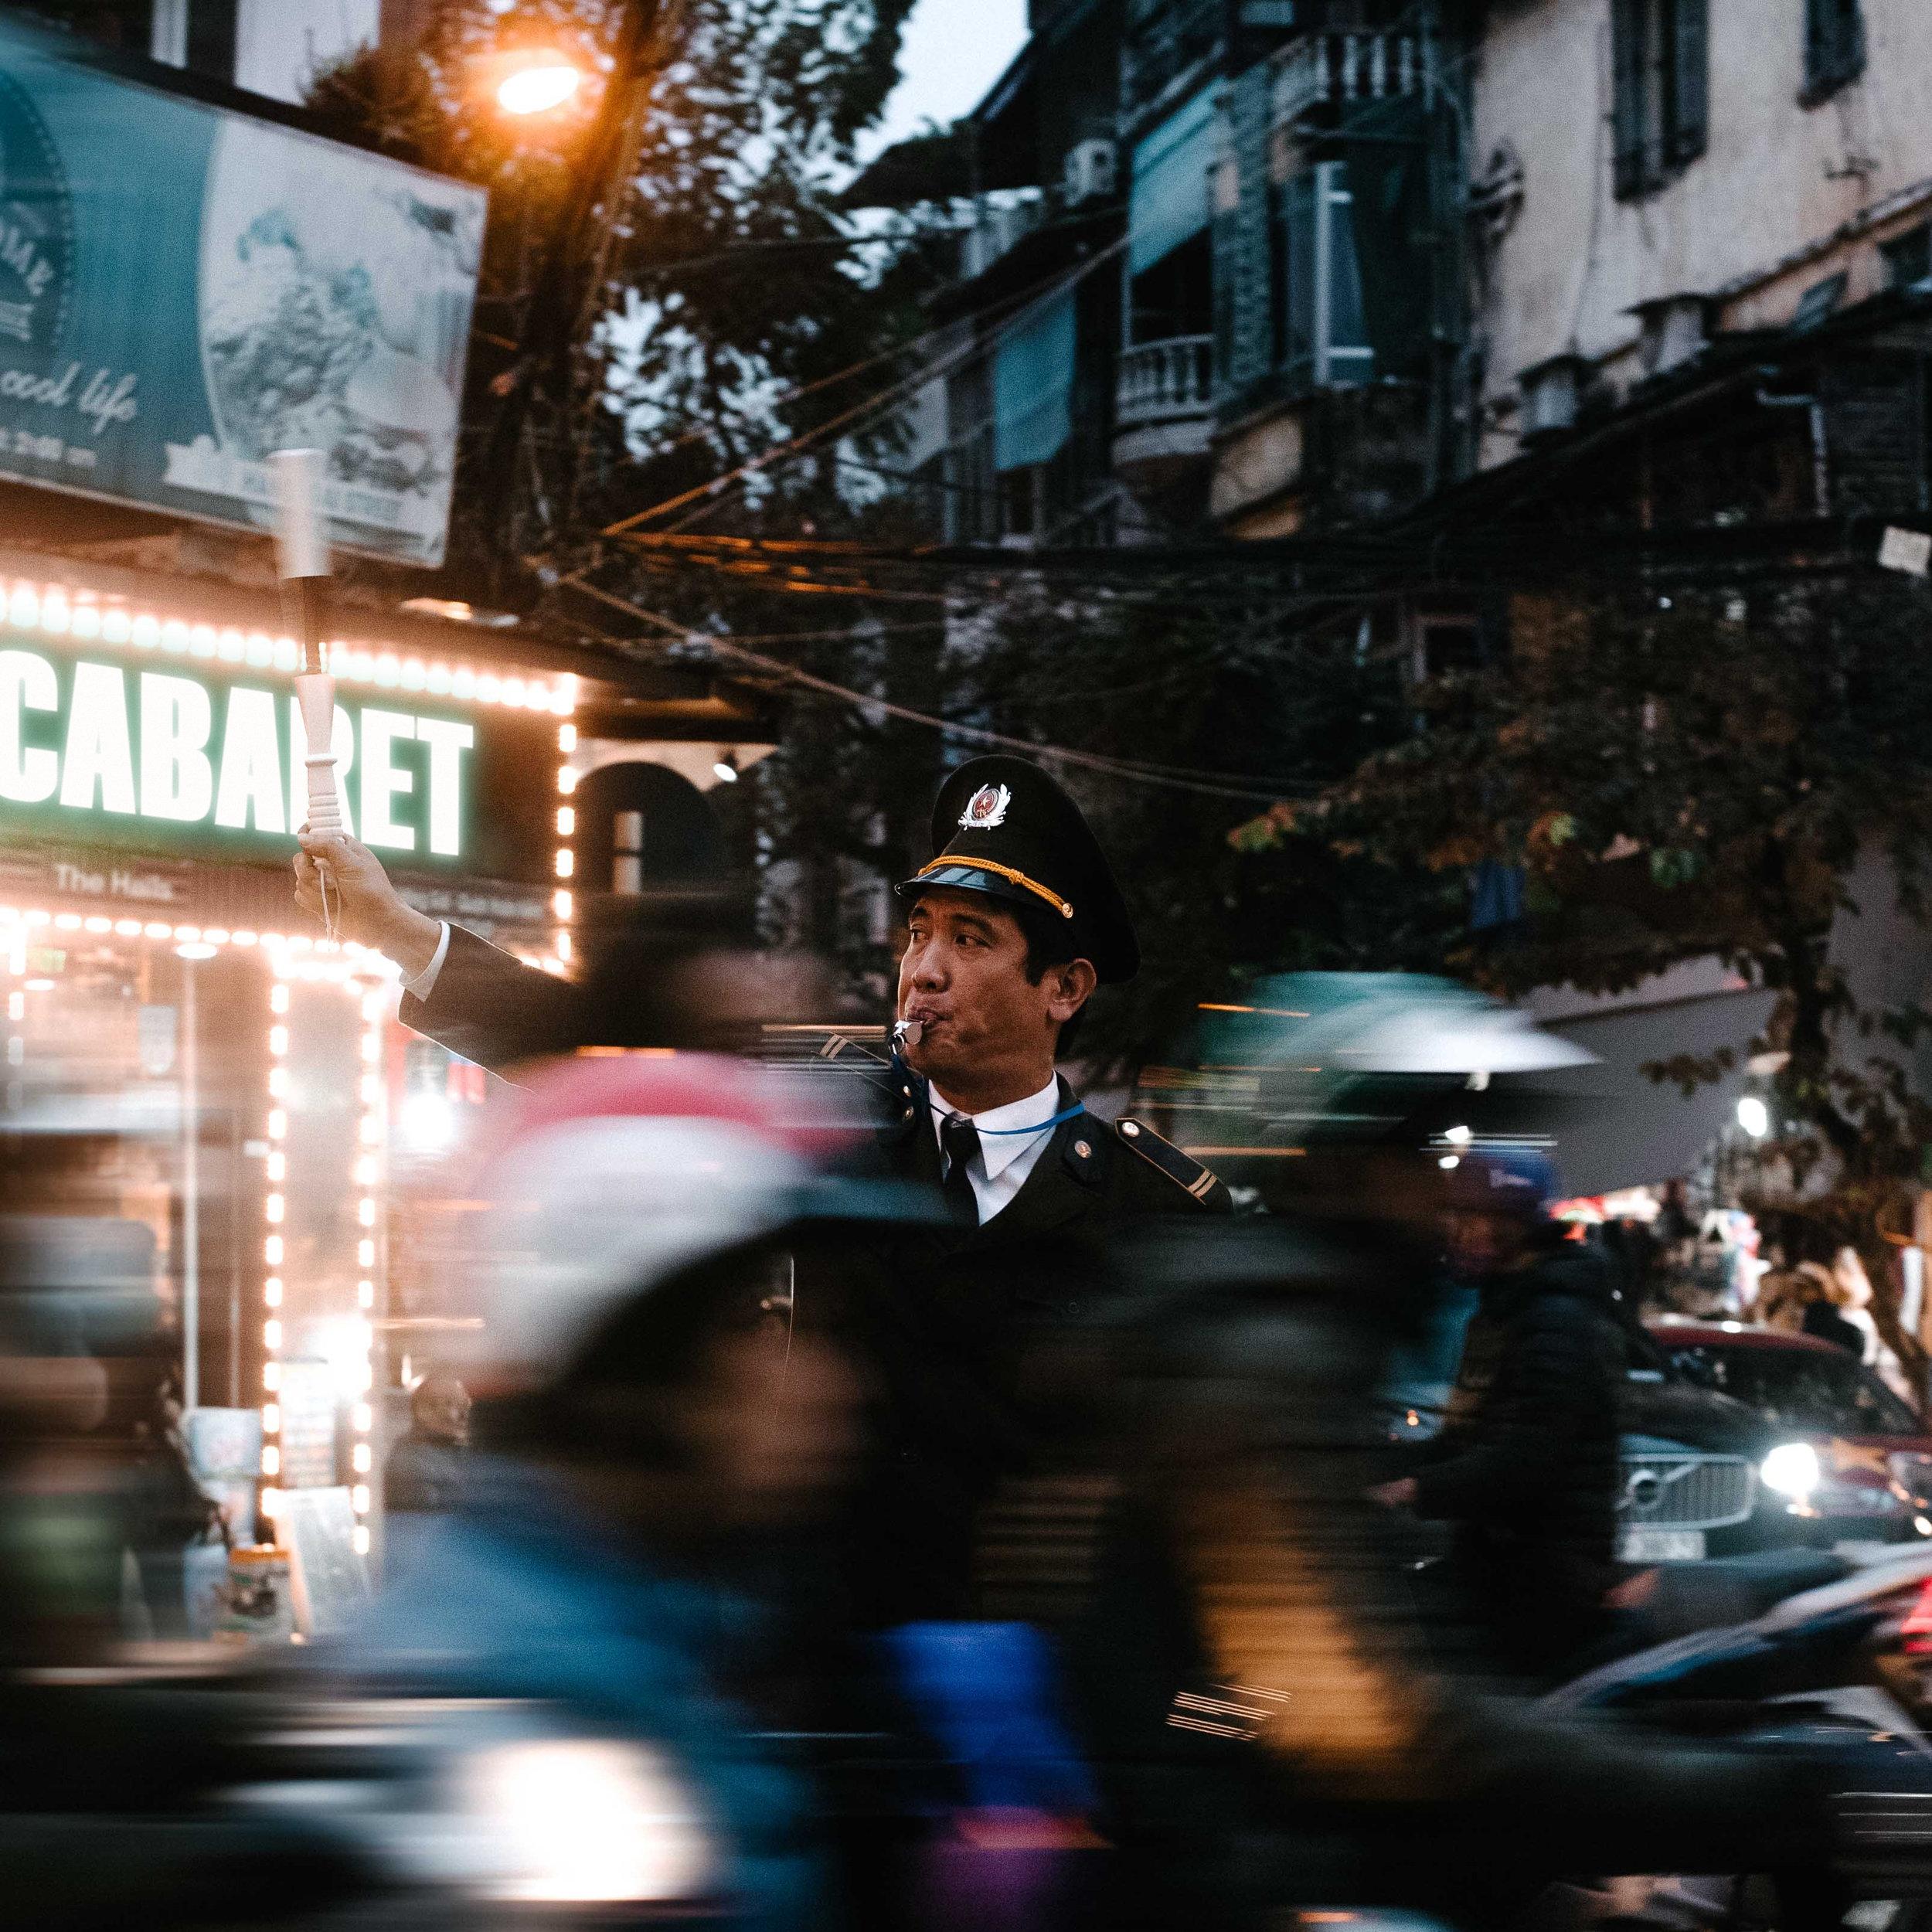 Cabaret - Single (2018) - 1. Cabaret